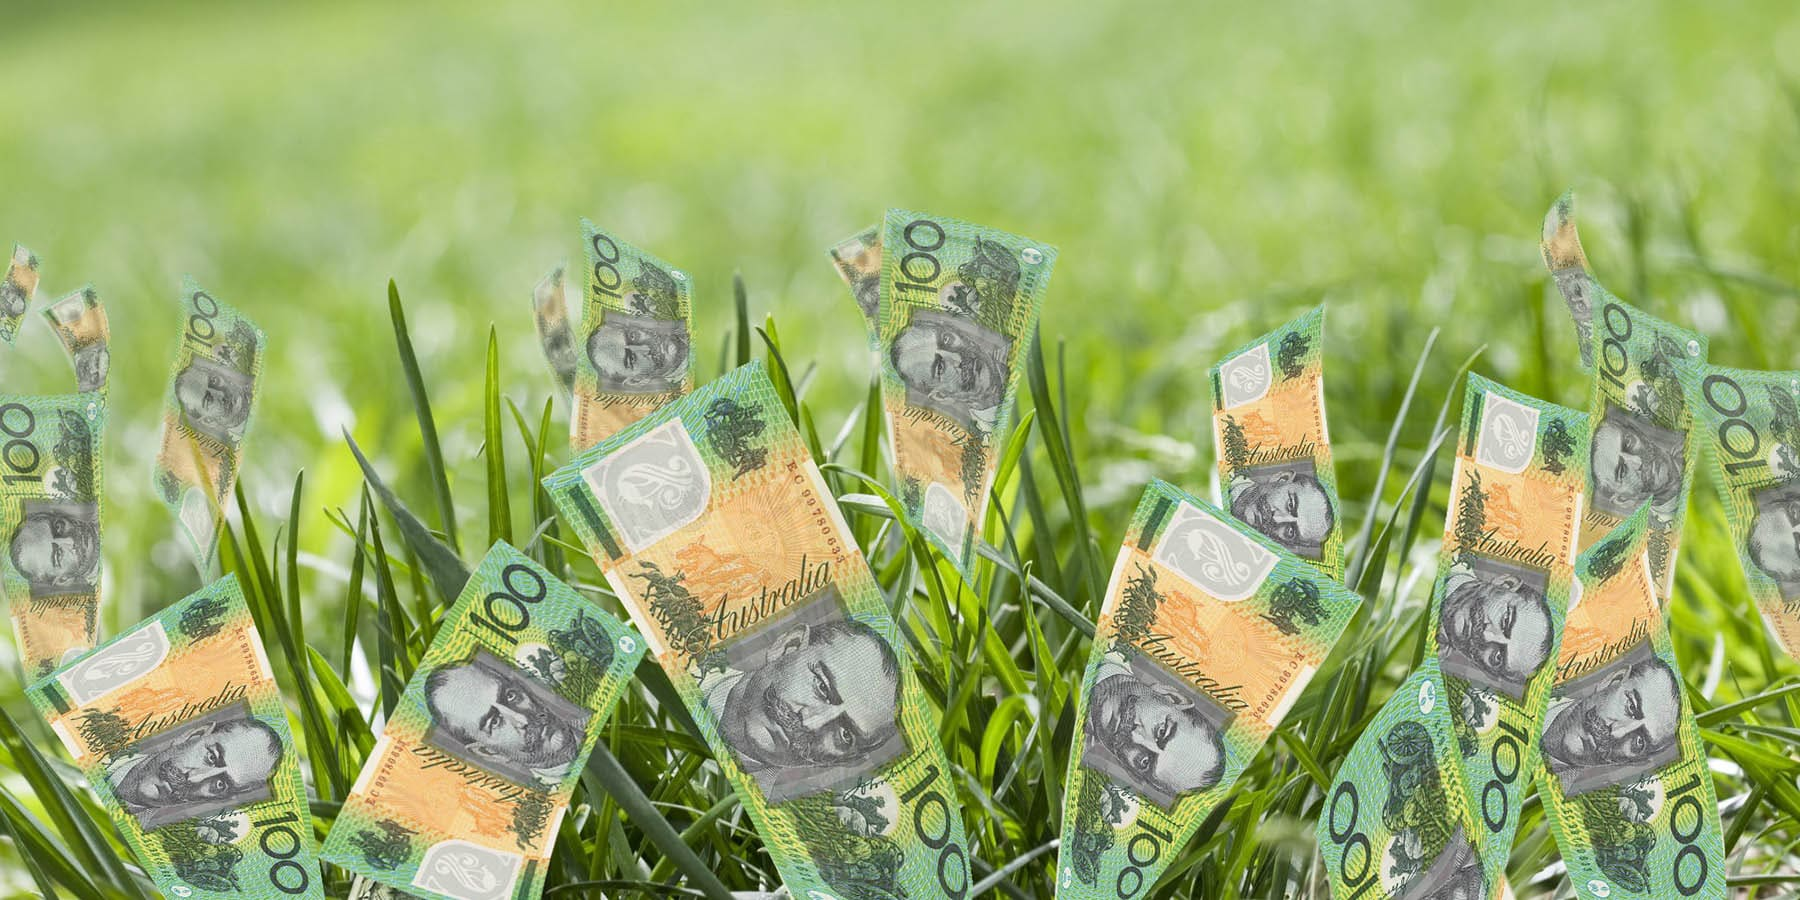 https://hartpartners.com.au/wp-content/uploads/2018/06/ATO-Combatting-the-Cash-Economy.jpg